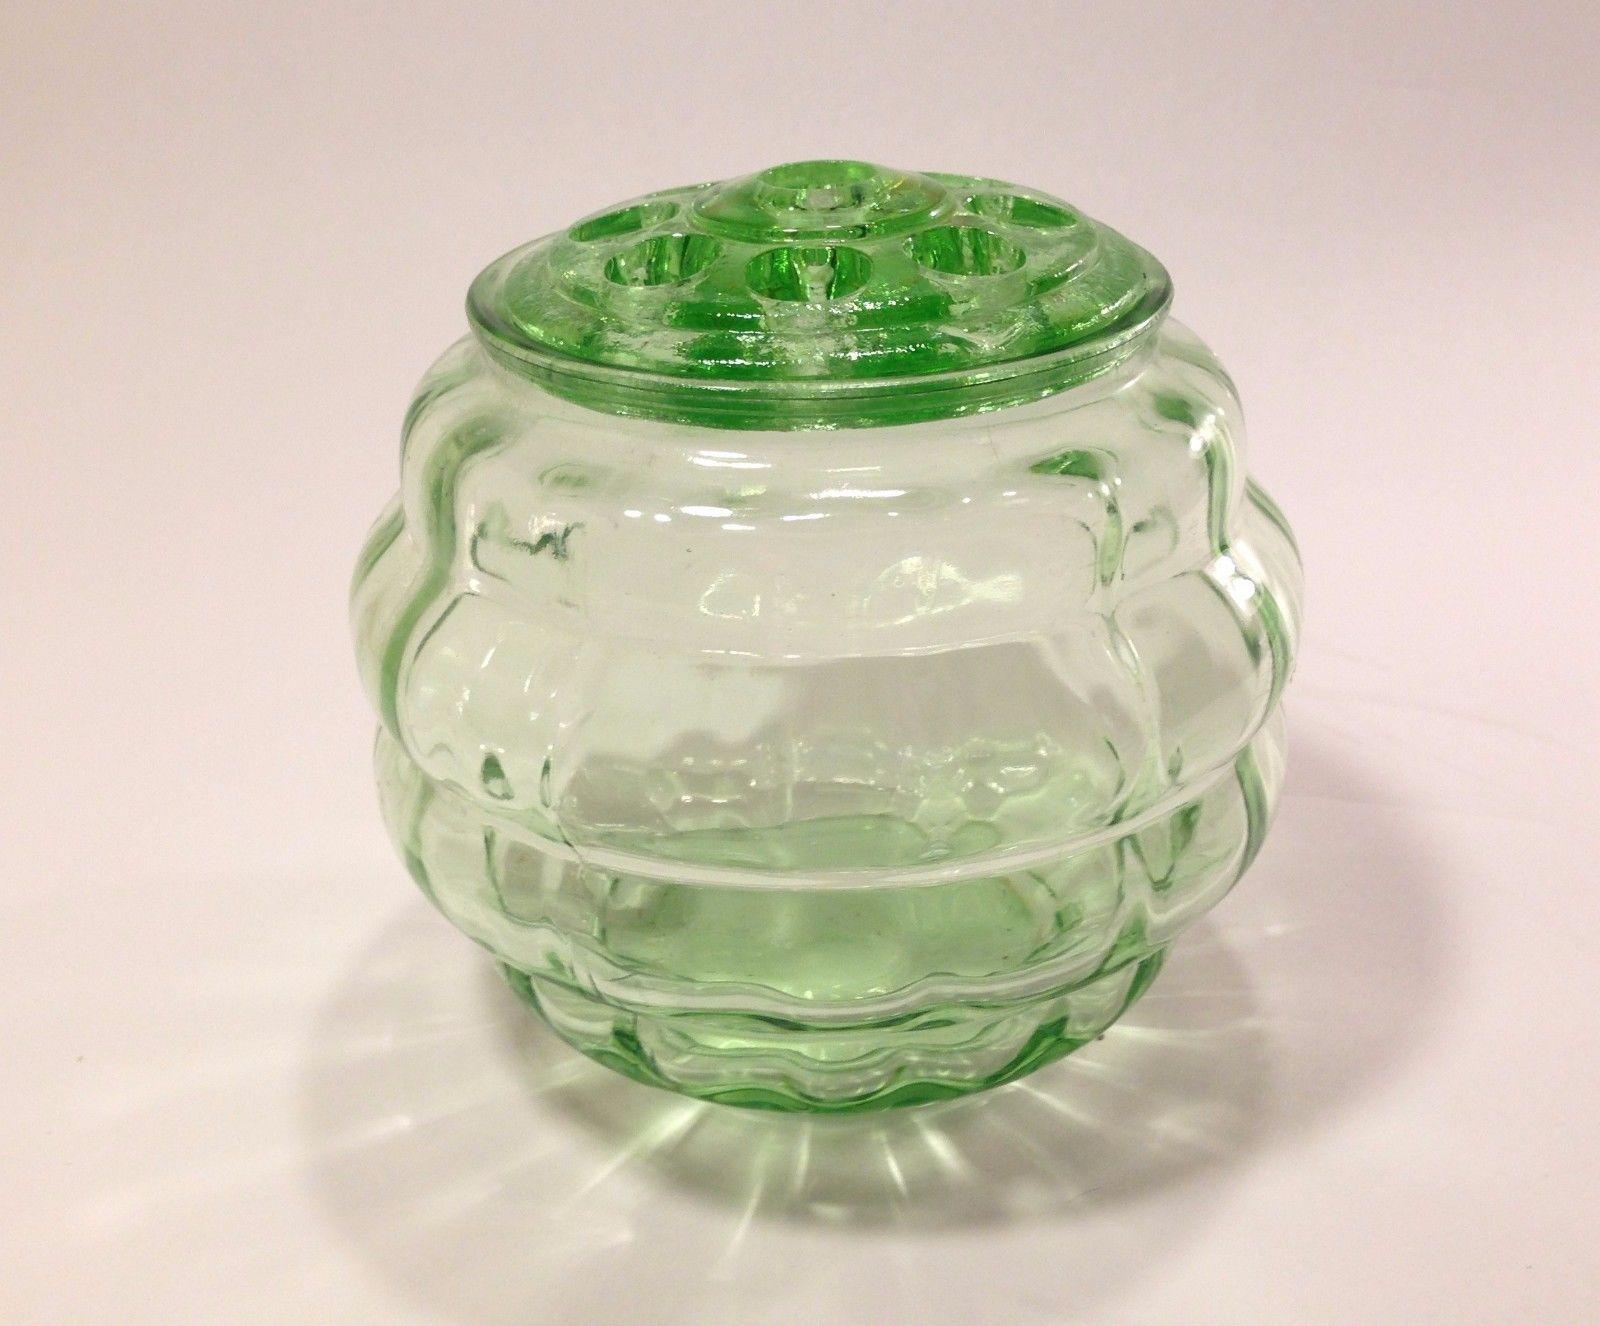 "VINTAGE GREEN DEPRESSION GLASS Vase Bowl FLOWER FROG 3 5/8"" 9 holes Optic  Round -- Antique Price Guide Details Page"